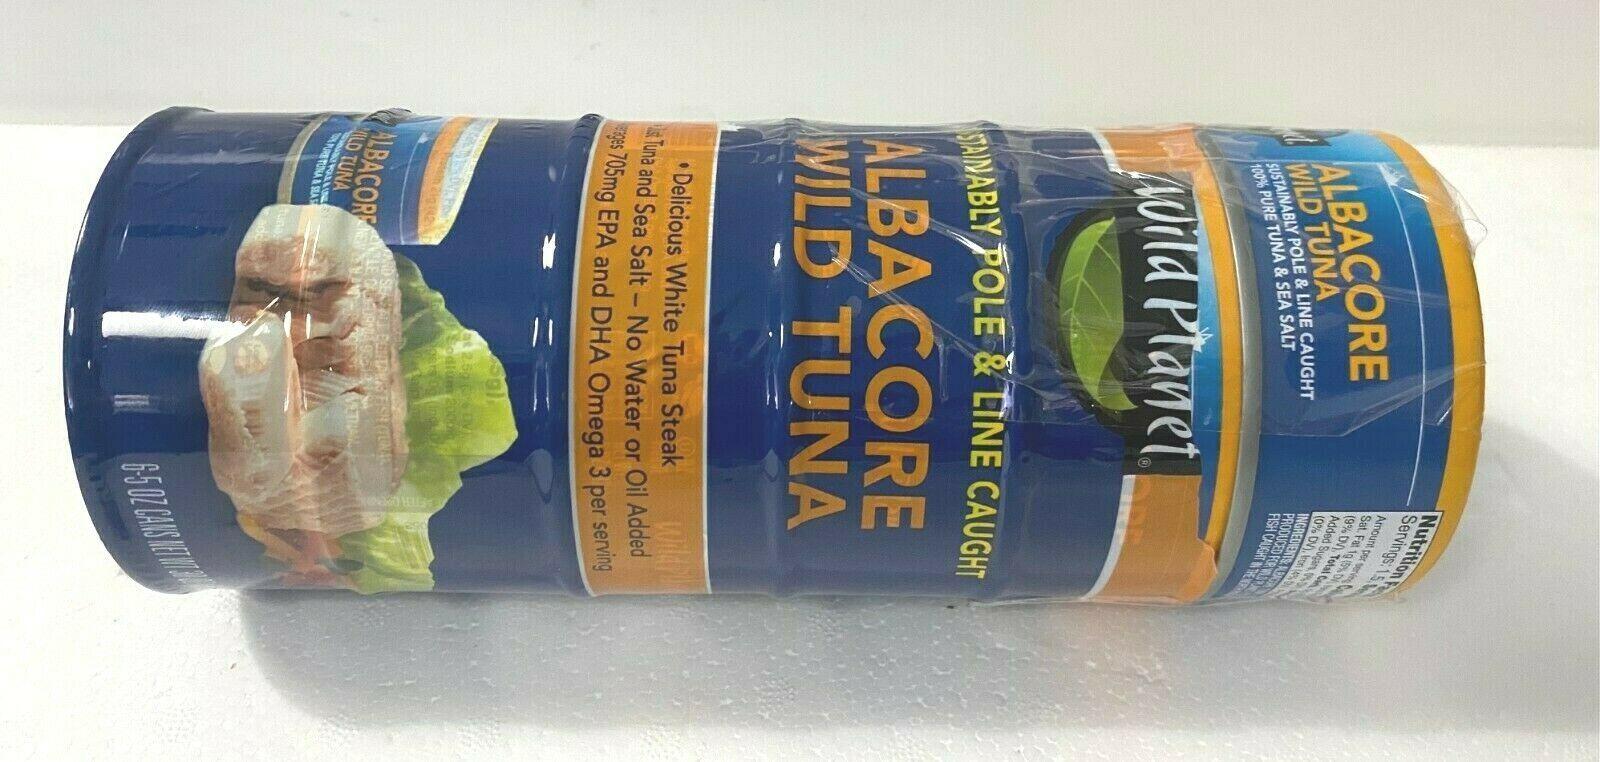 6-PK Wild Planet Wild Albacore Tuna, No Salt Added, 5 oz Cans 8/23